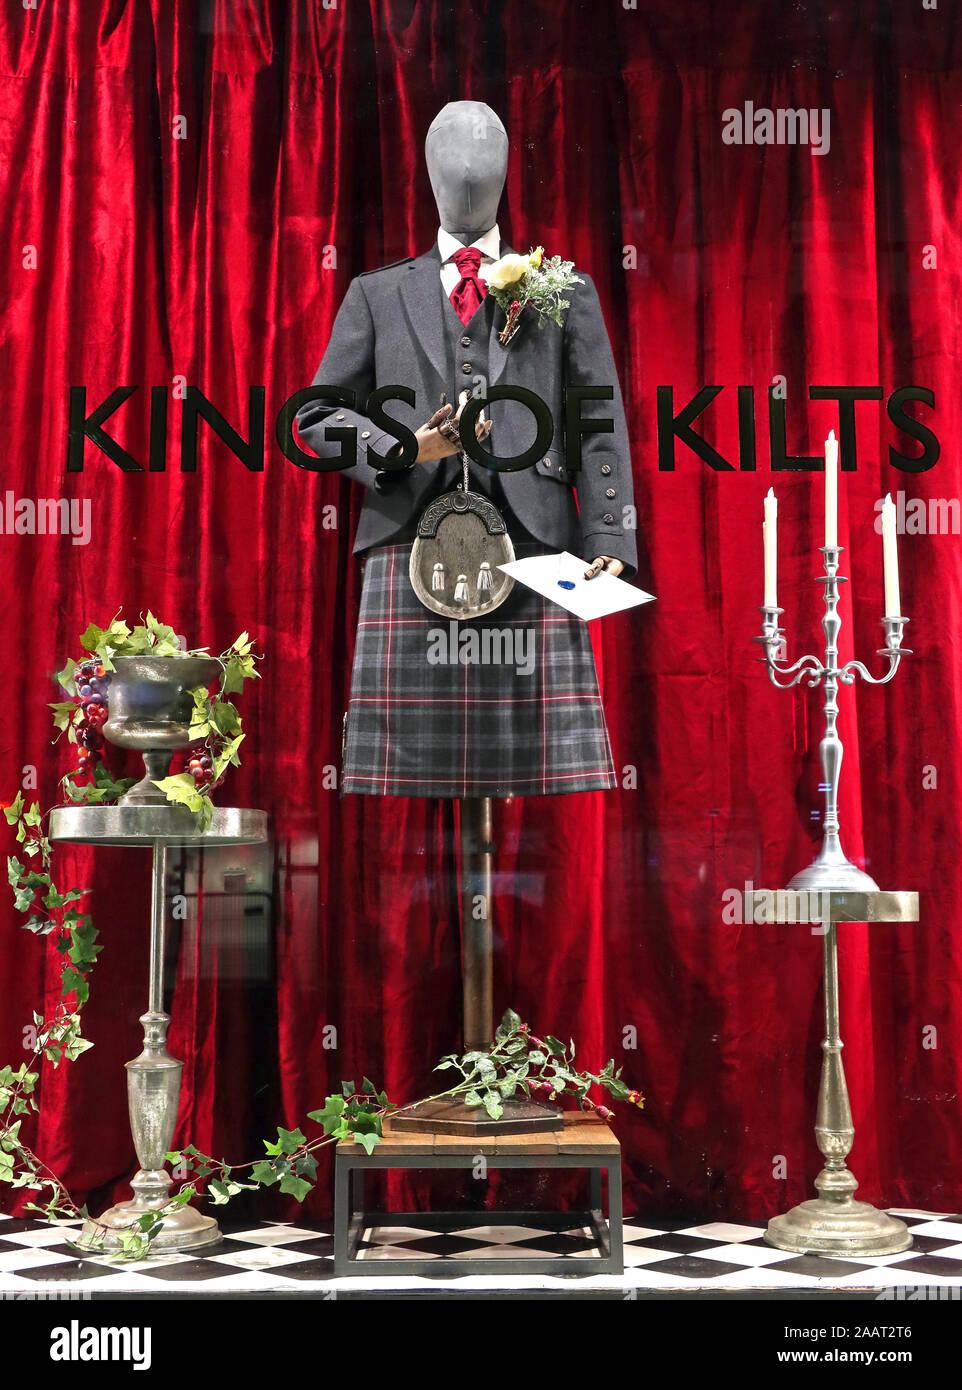 HotpixUk,@HotpixUK,GoTonySmith,UK,England,English,dummy,in kilt,in a kilt,skirt,mens skirt,shop,Bath Street,Glasgow,Scotland,G2 1HW,Kilt Store,G2,Scottish,clothing,tartan,shop window,candle,candle stick,candlestick,ghillie shirt,kilt outfits,ghillie,knee-length non-bifurcated skirt with pleats at the back,knee-length,non-bifurcated skirt,Scottish Highlands,Highlanders,great kilt,formal kilt,philibeg,Scottish kilt,King of kilts